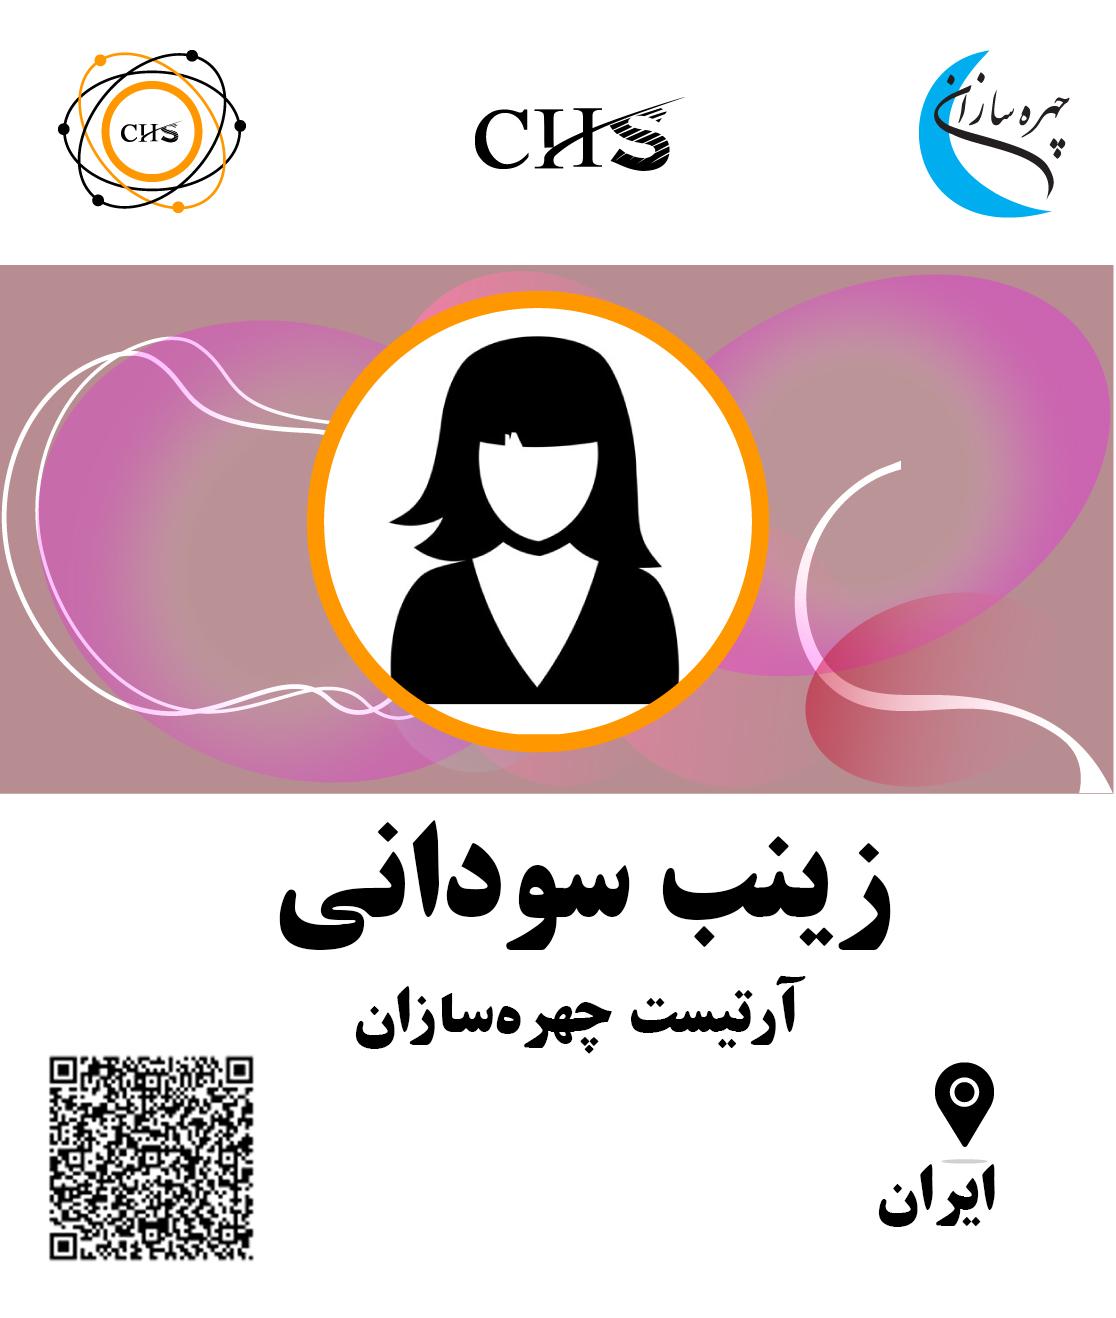 keywords * زینب سودانی, مدرک آموزشی آرایش دائم , مدرک آرایش دائم , آموزش آرایش دائم , * زینب سودانی مدرک آموزشی,